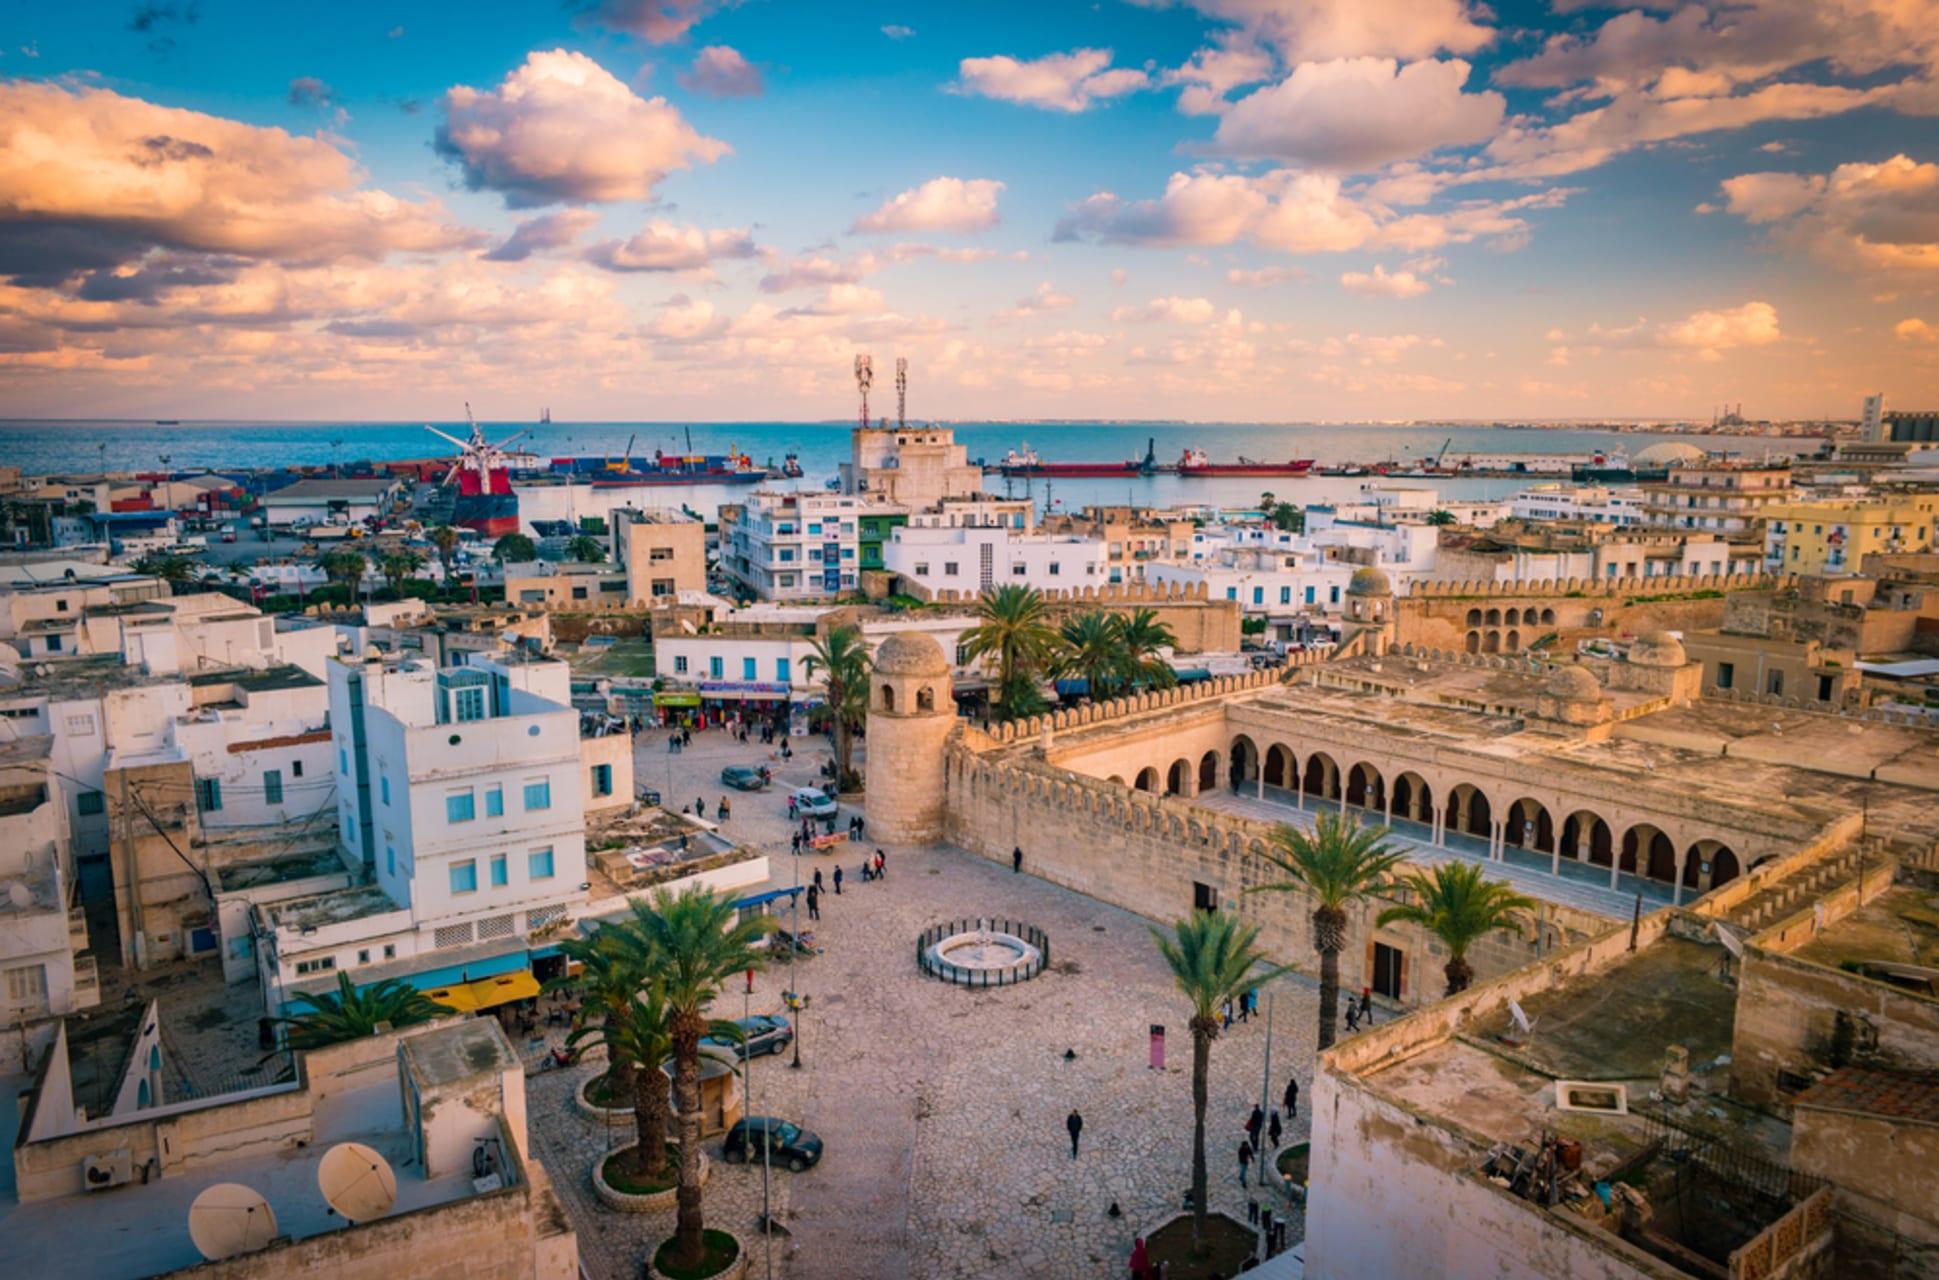 Sousse - The Medina of Sousse